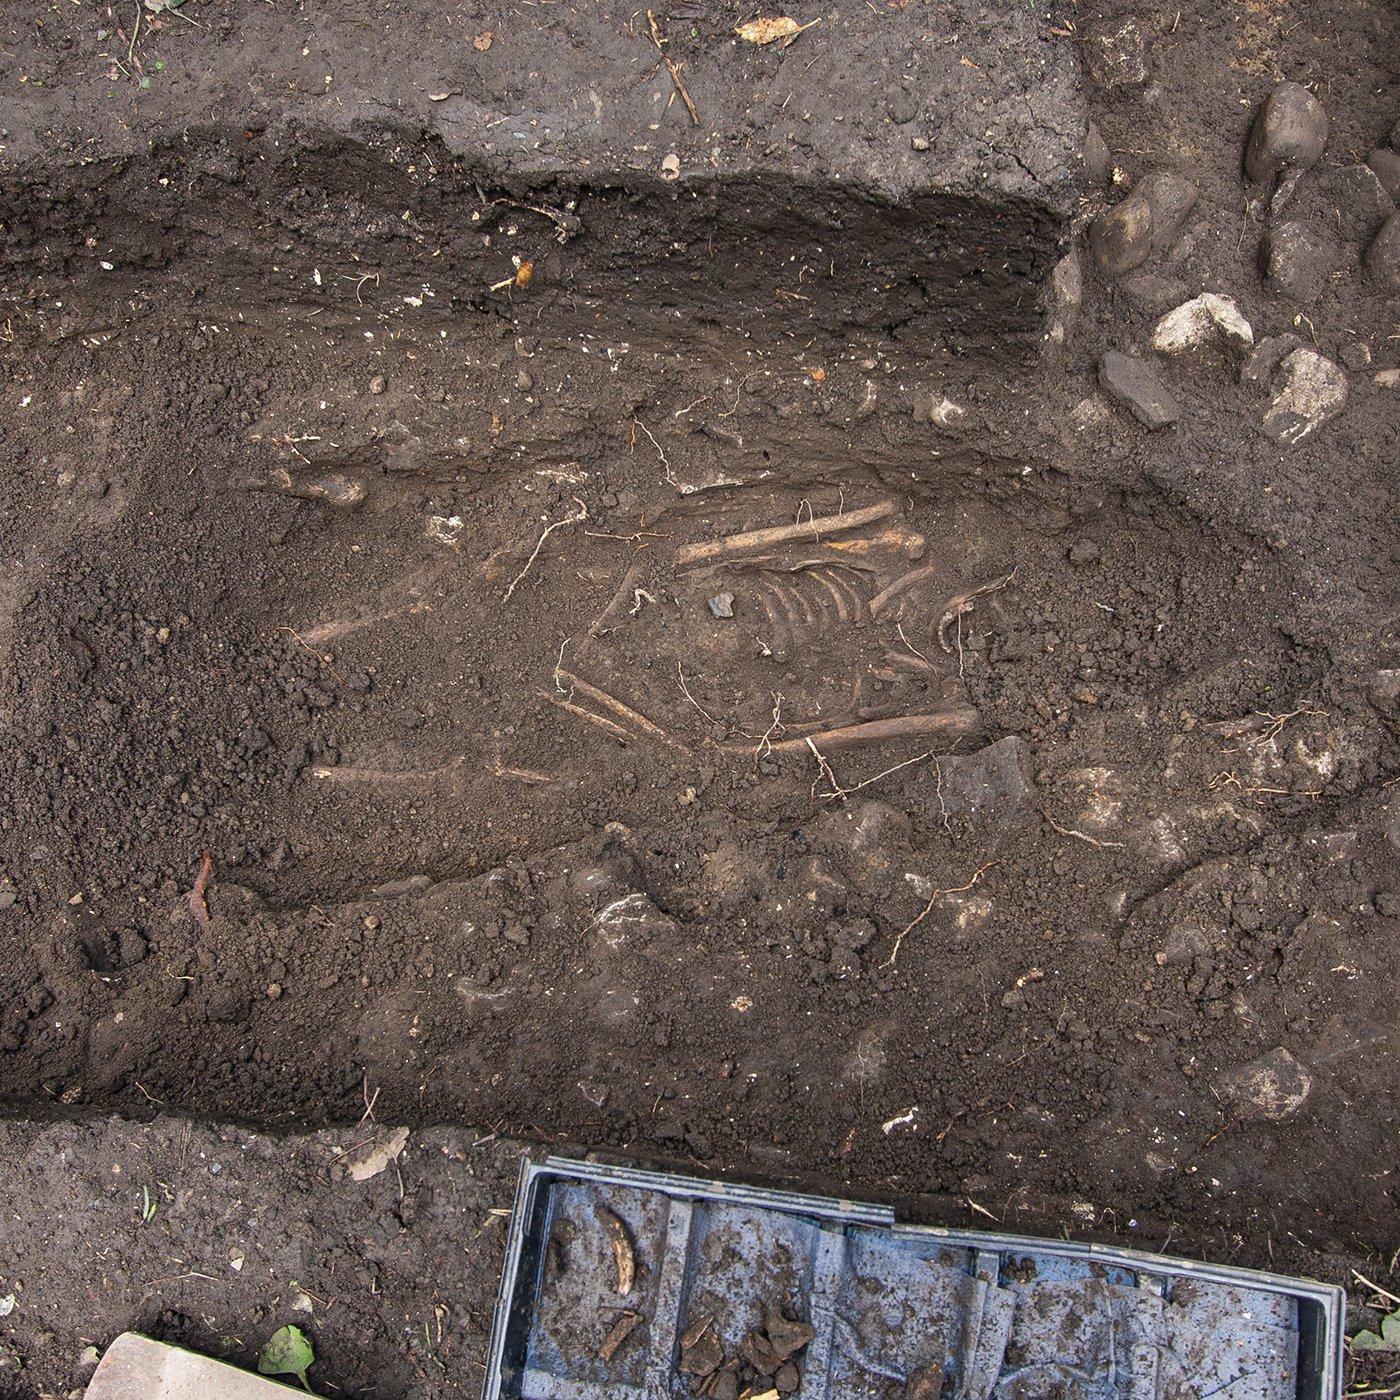 Tadcaster Castle Burials Dig